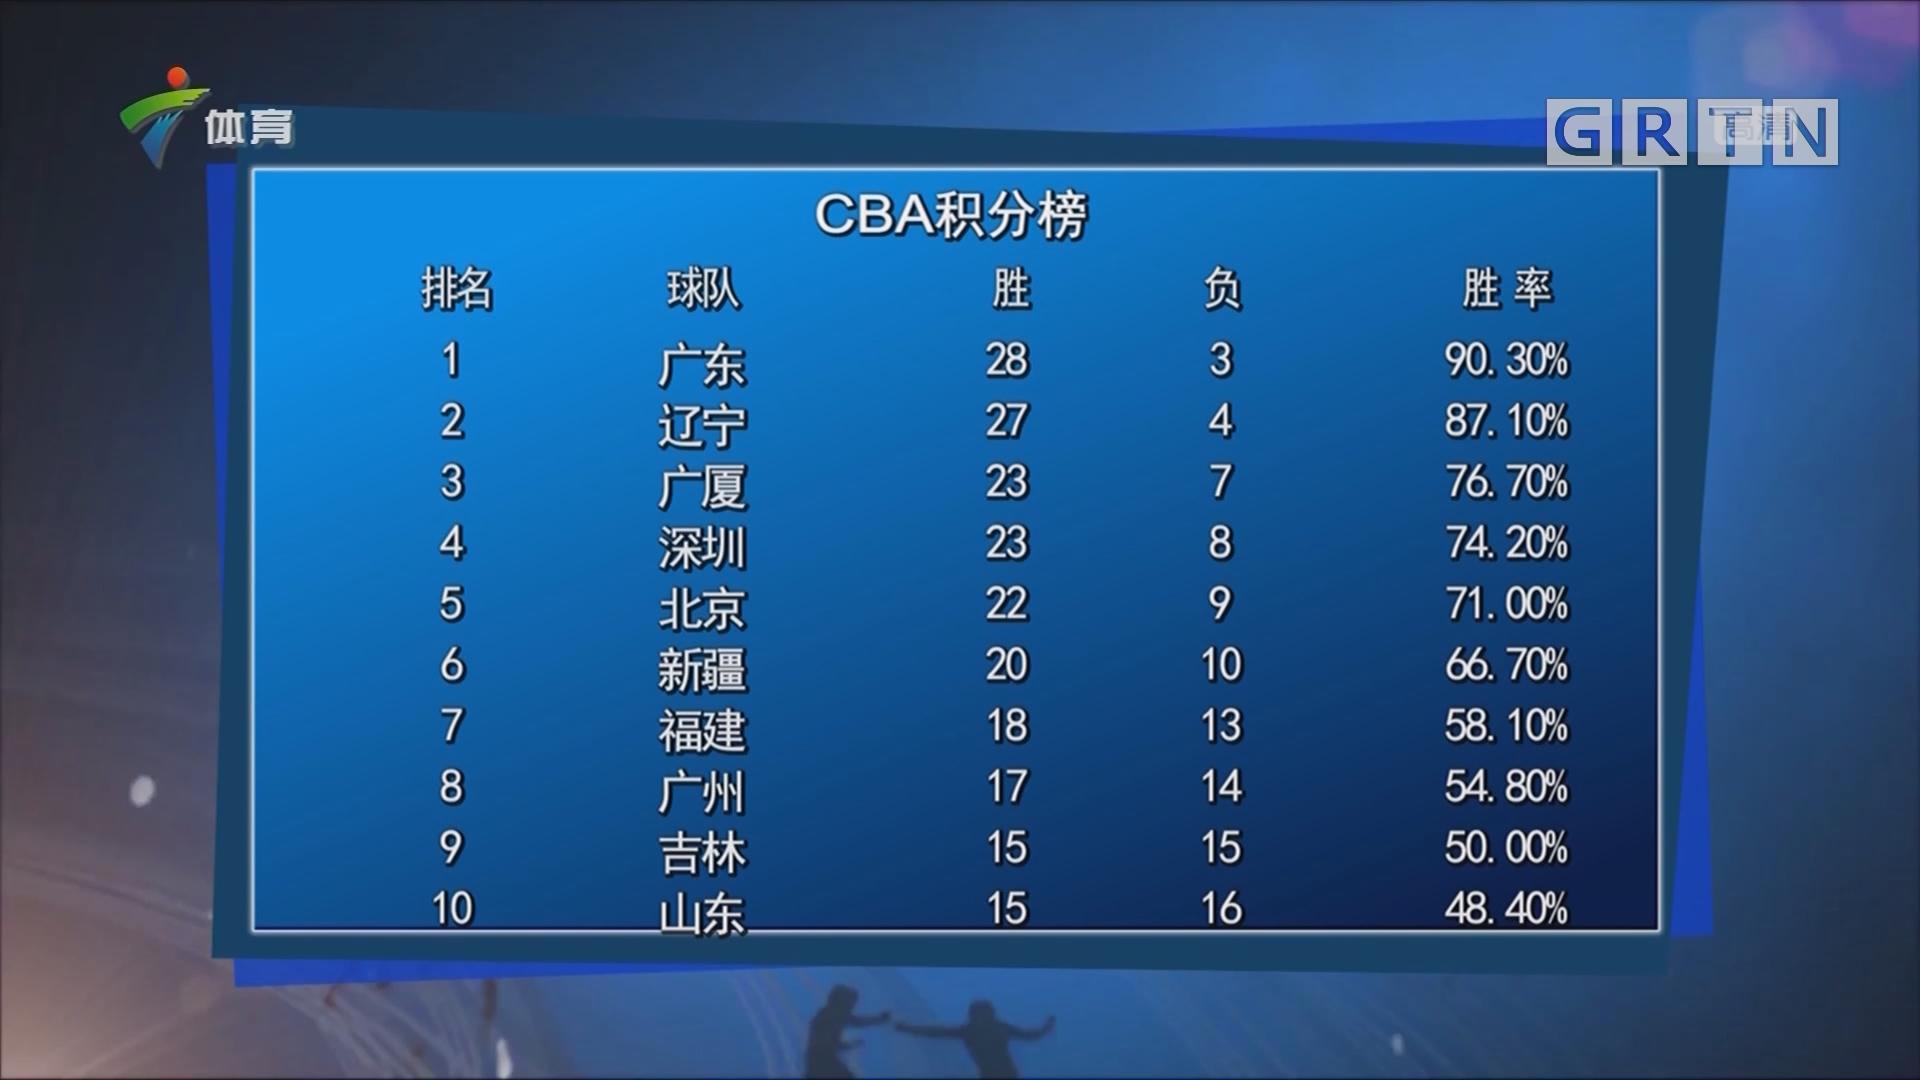 CBA积分榜